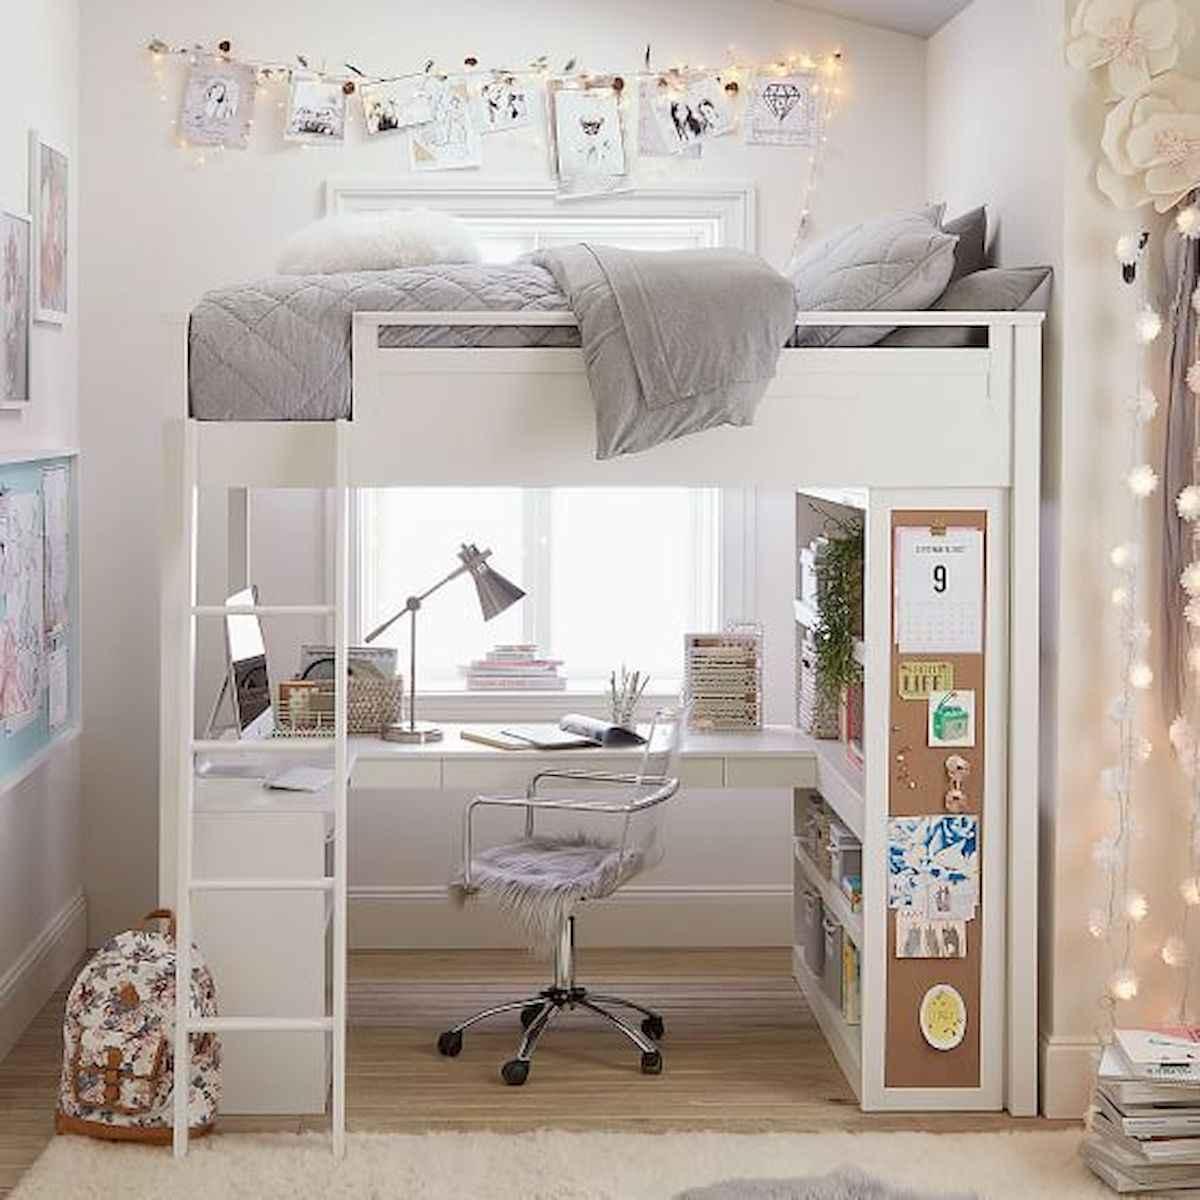 80 Fantastic Small Apartment Bedroom College Design Ideas and Decor (71)